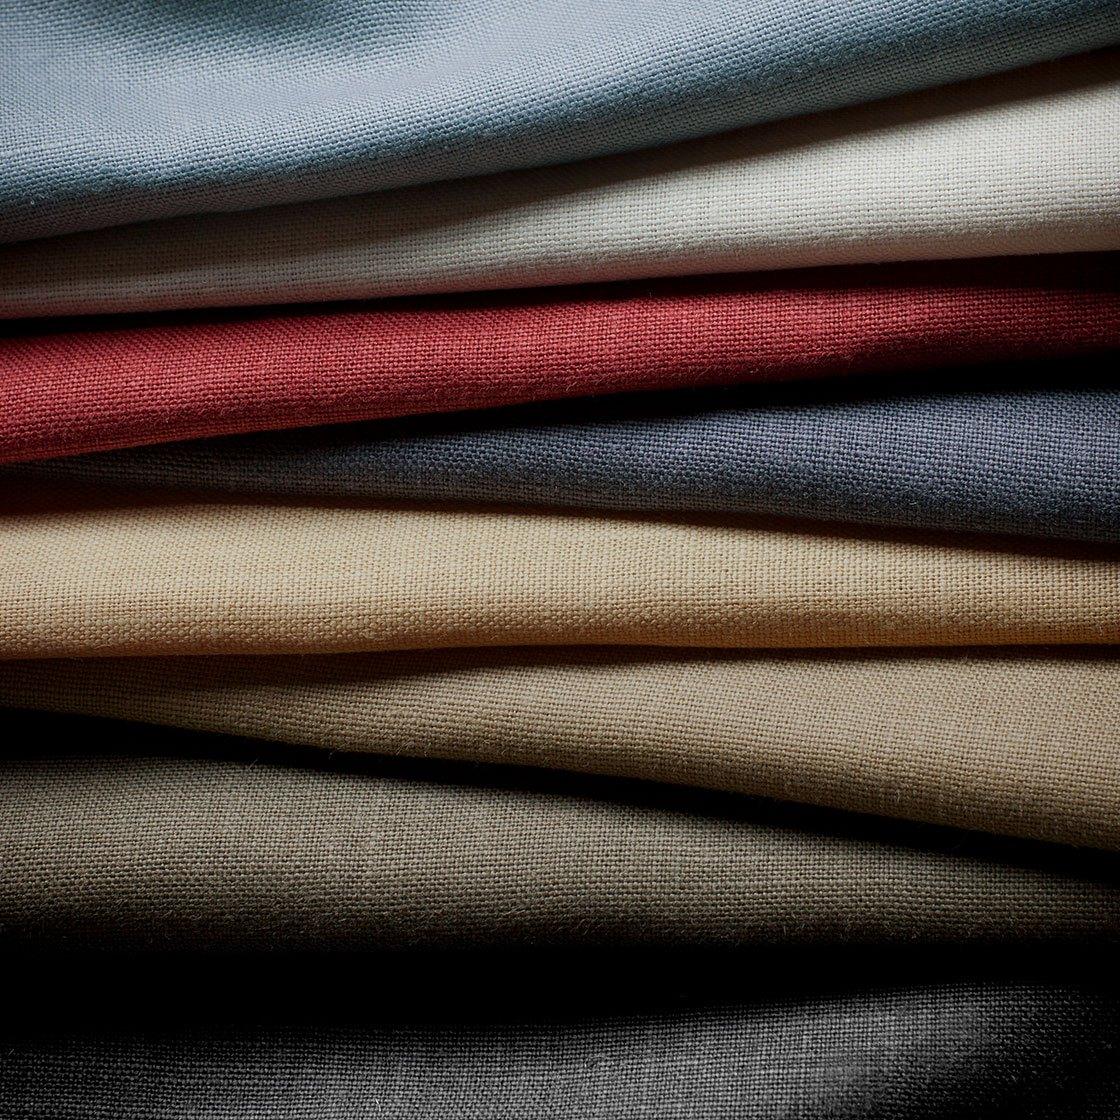 Bantry Linen - Group - Beaumont & Fletcher - Beaumont & Fletcher